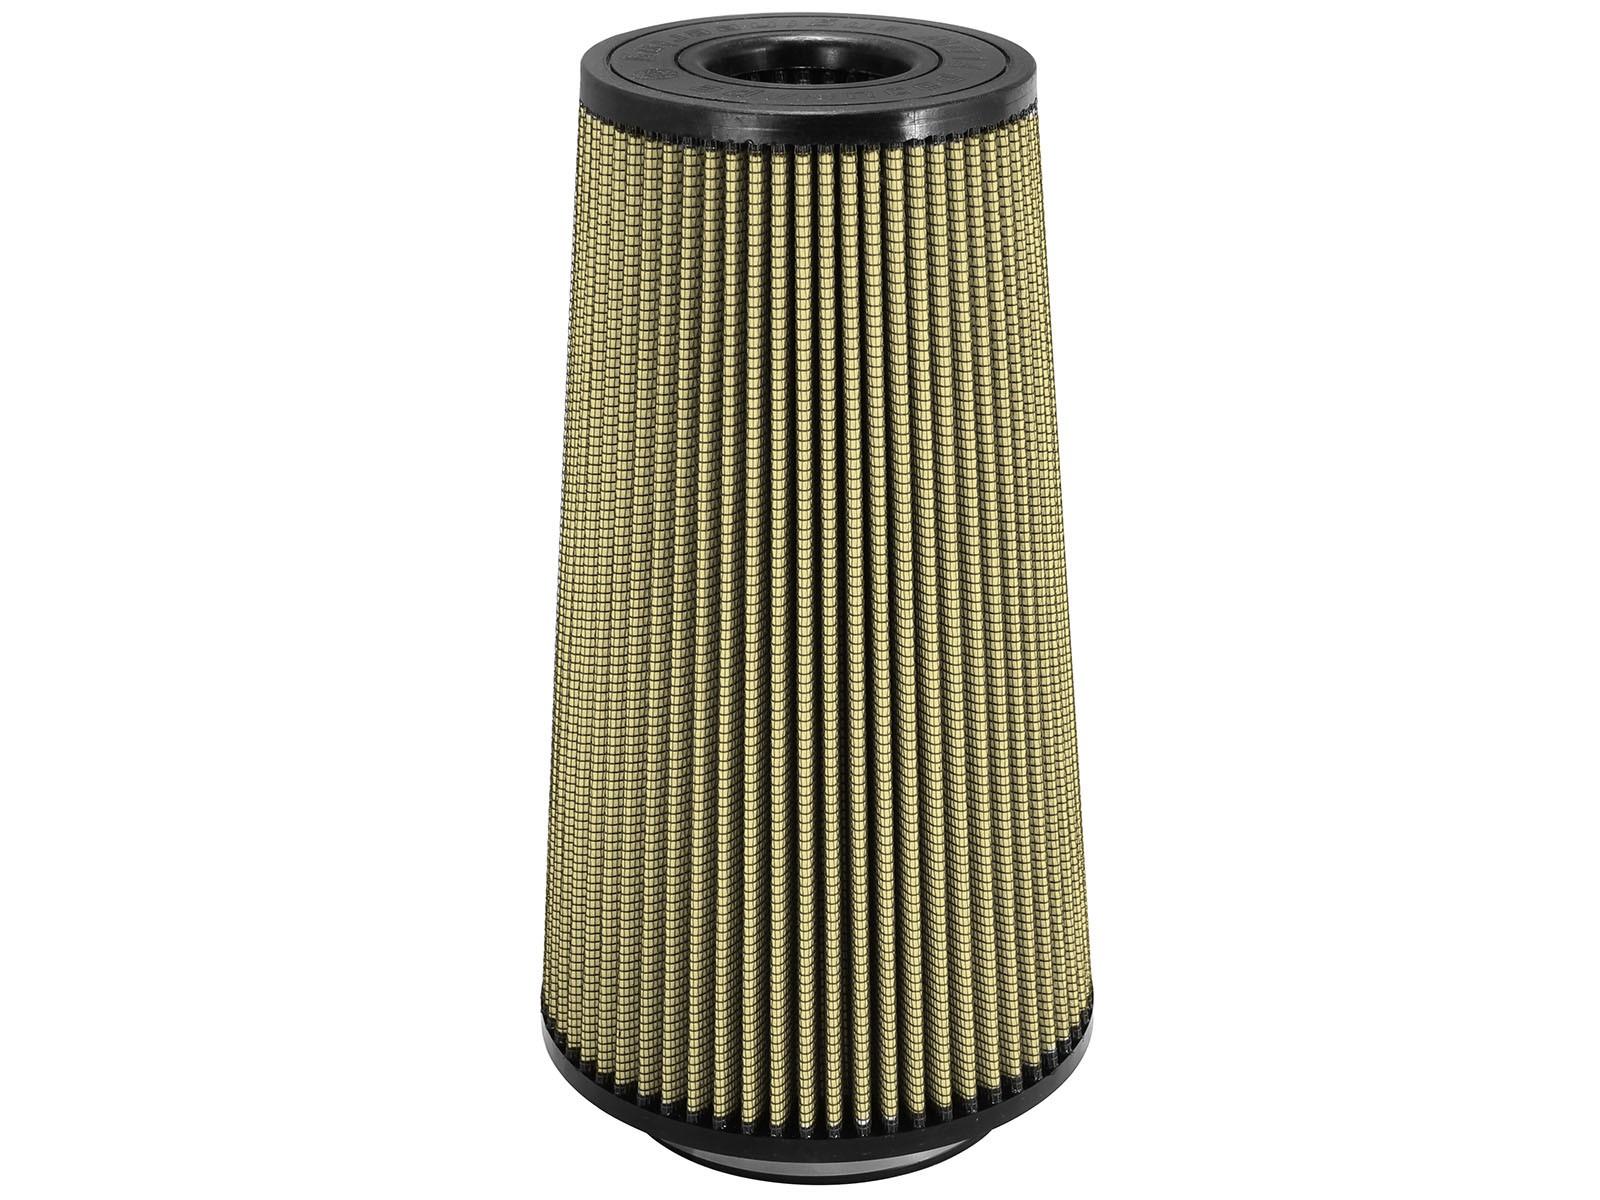 aFe POWER 72-91096 Magnum FLOW Pro GUARD7 Air Filter